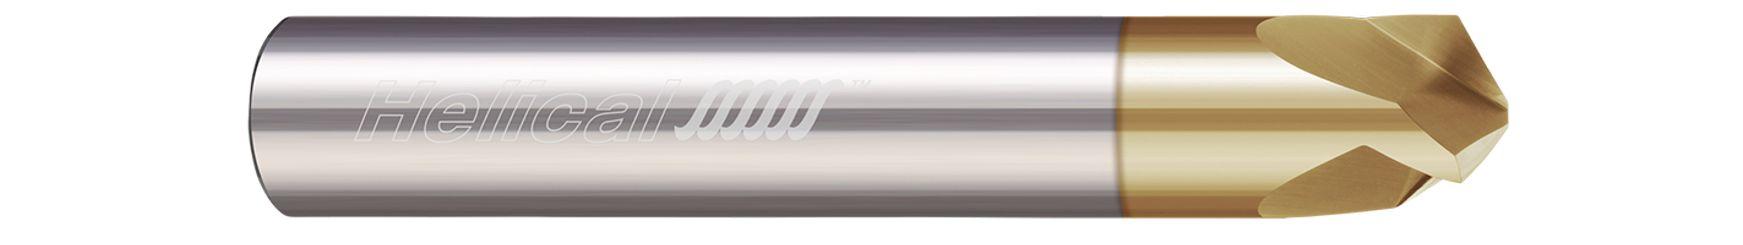 tool-details-59831